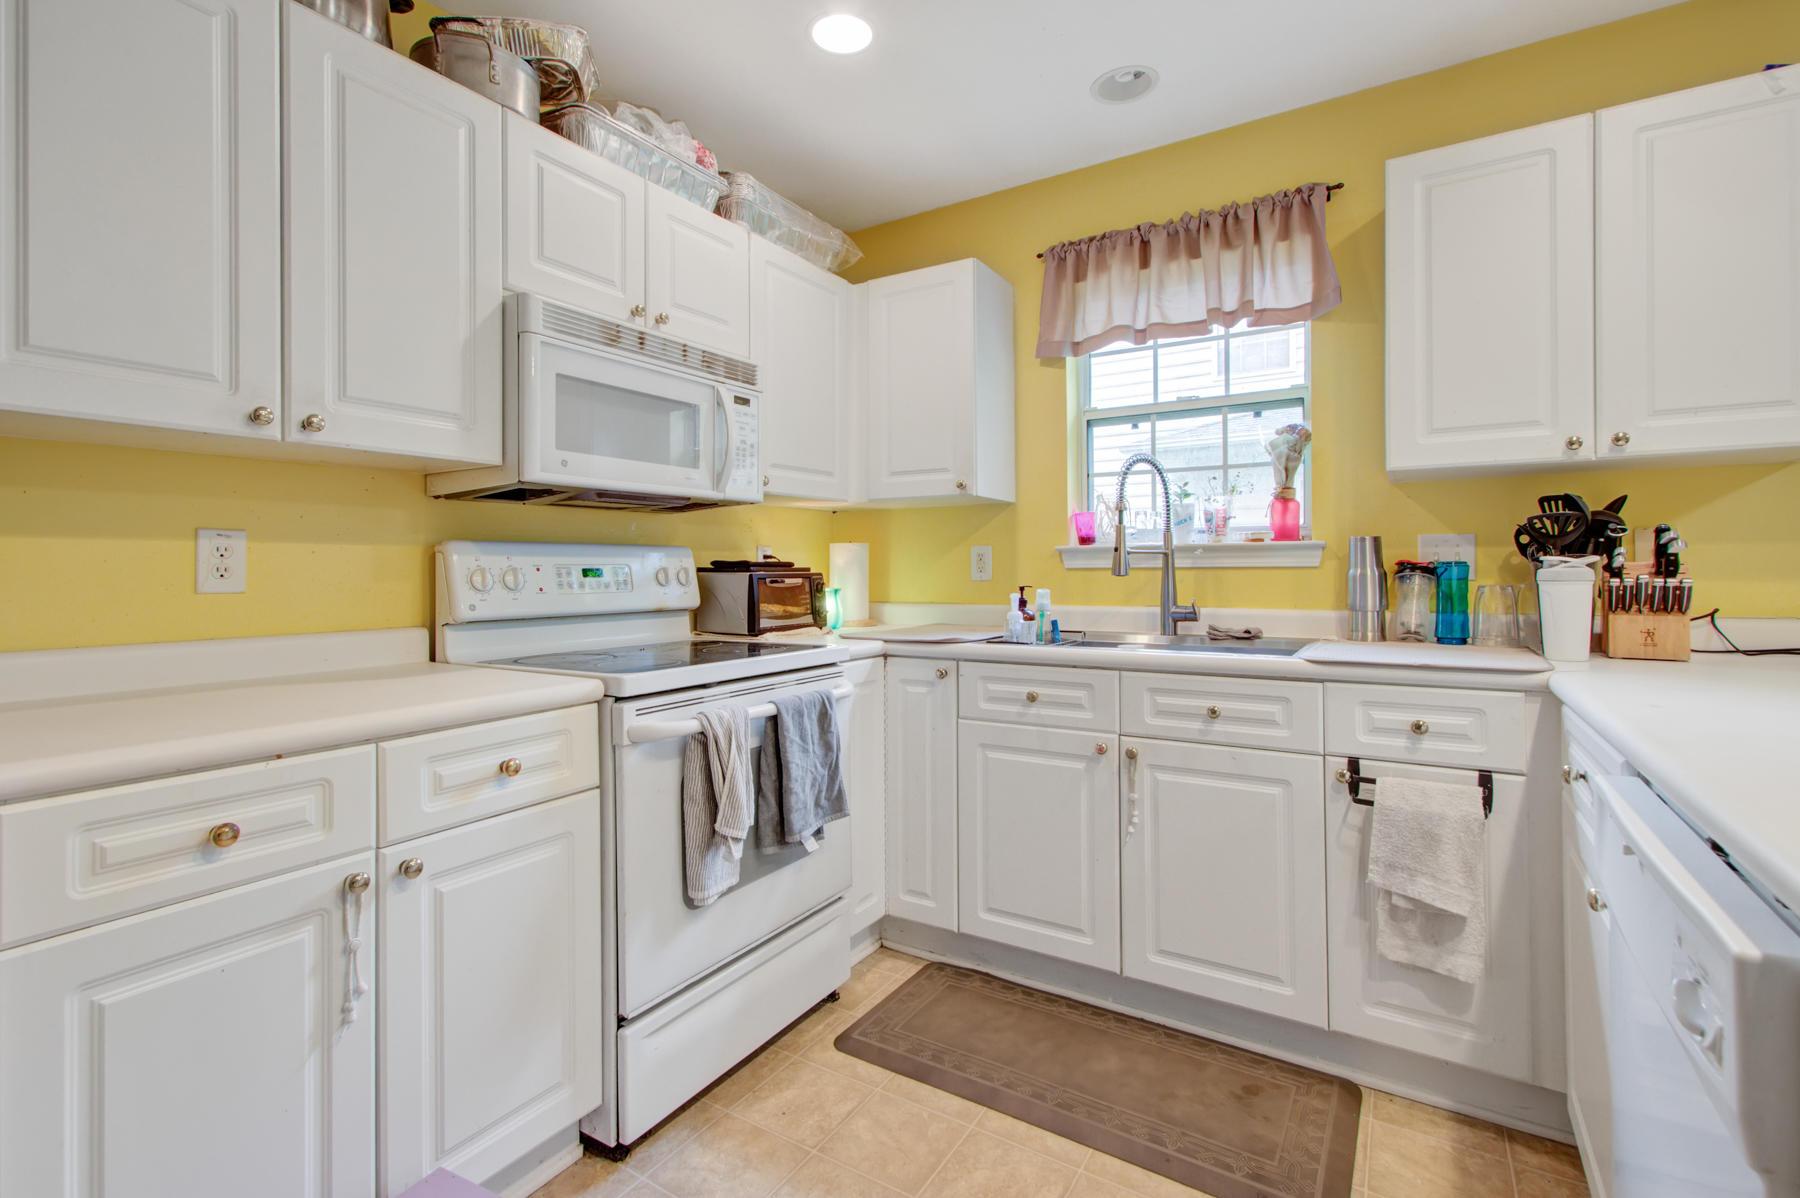 Dunes West Homes For Sale - 2232 Kings Gate, Mount Pleasant, SC - 30